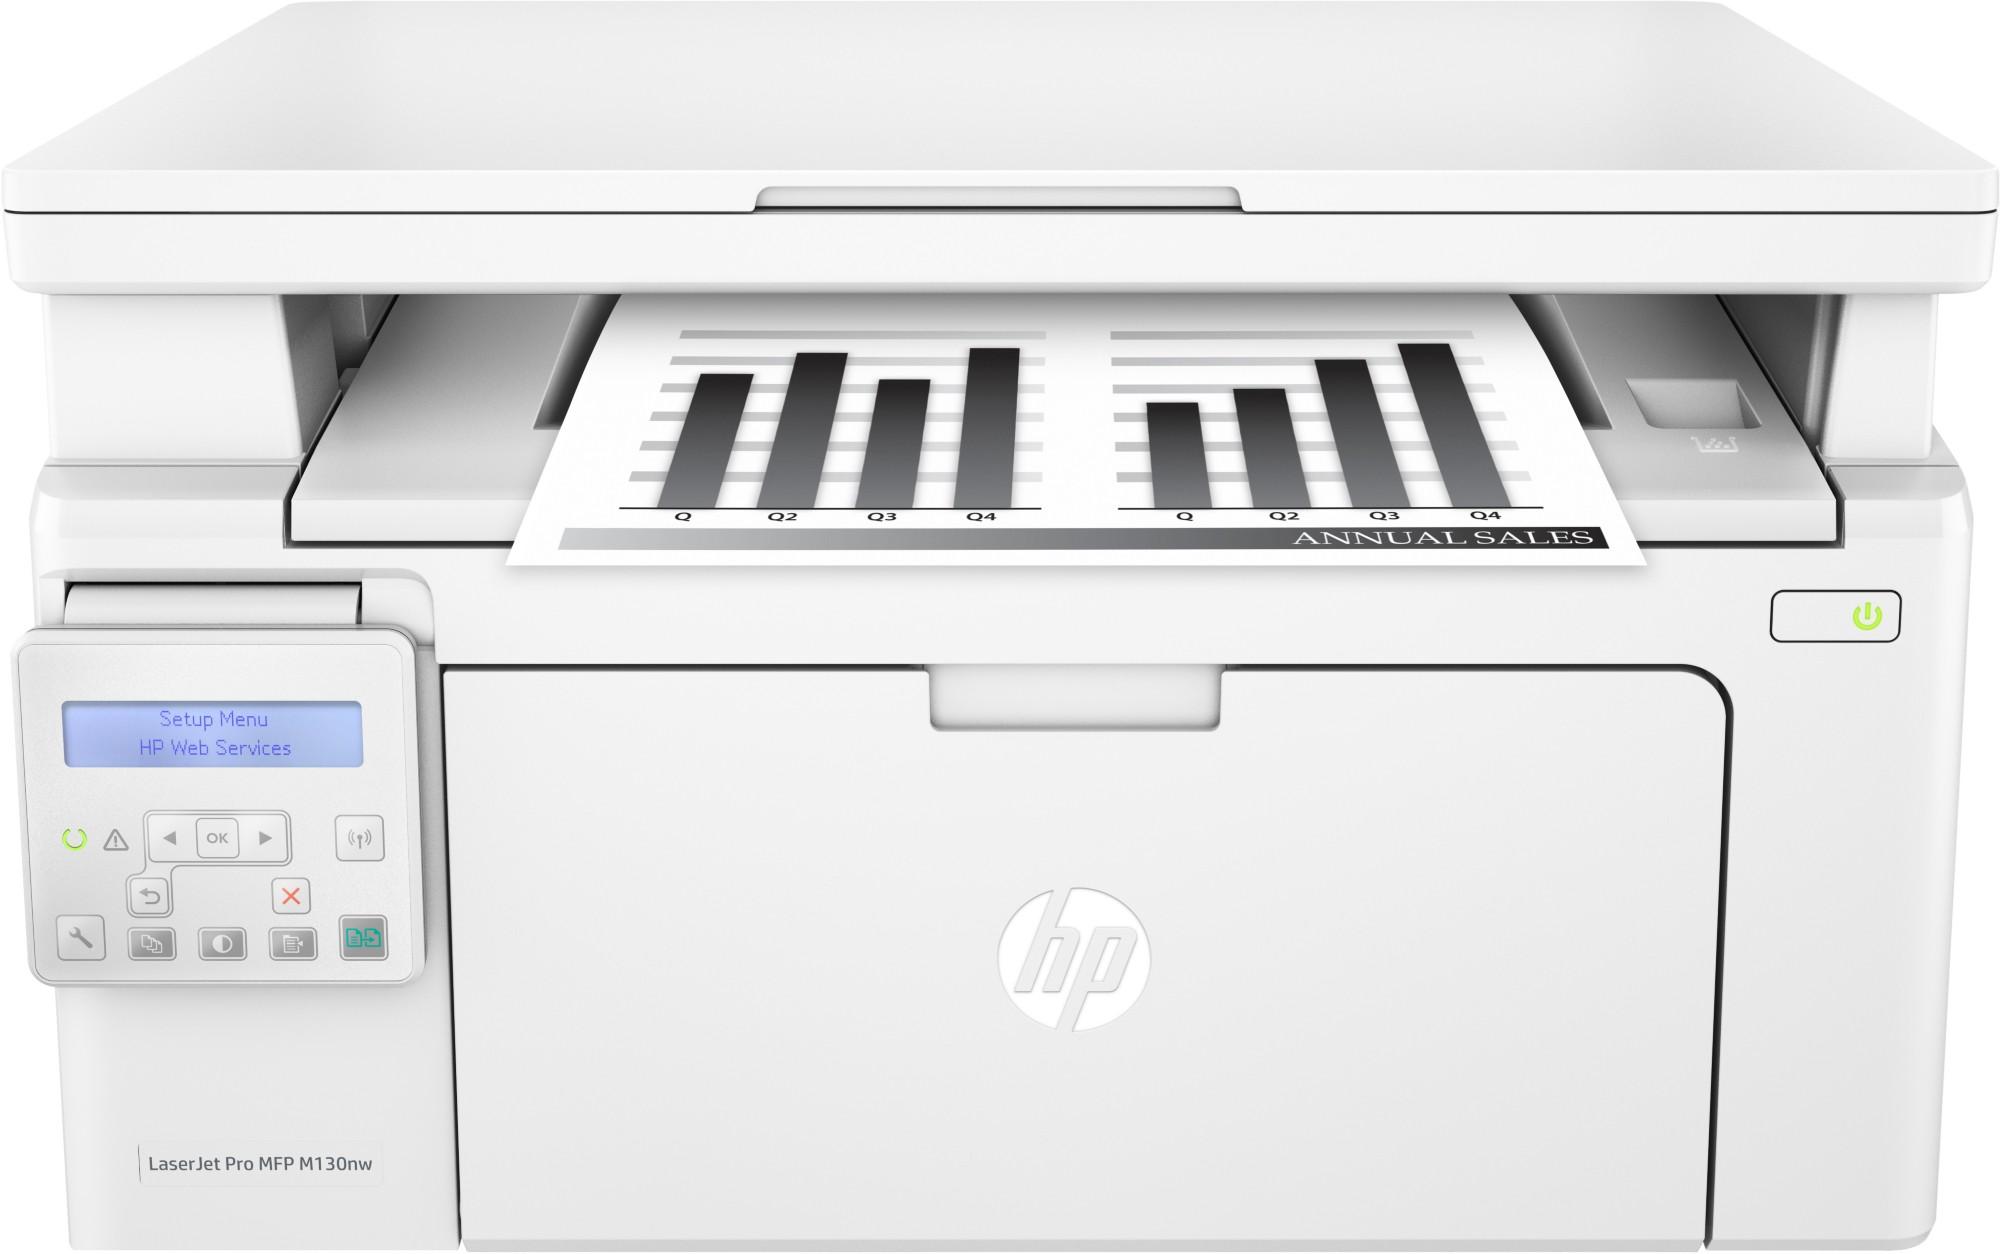 HP LaserJet Pro Pro MFP M130nw